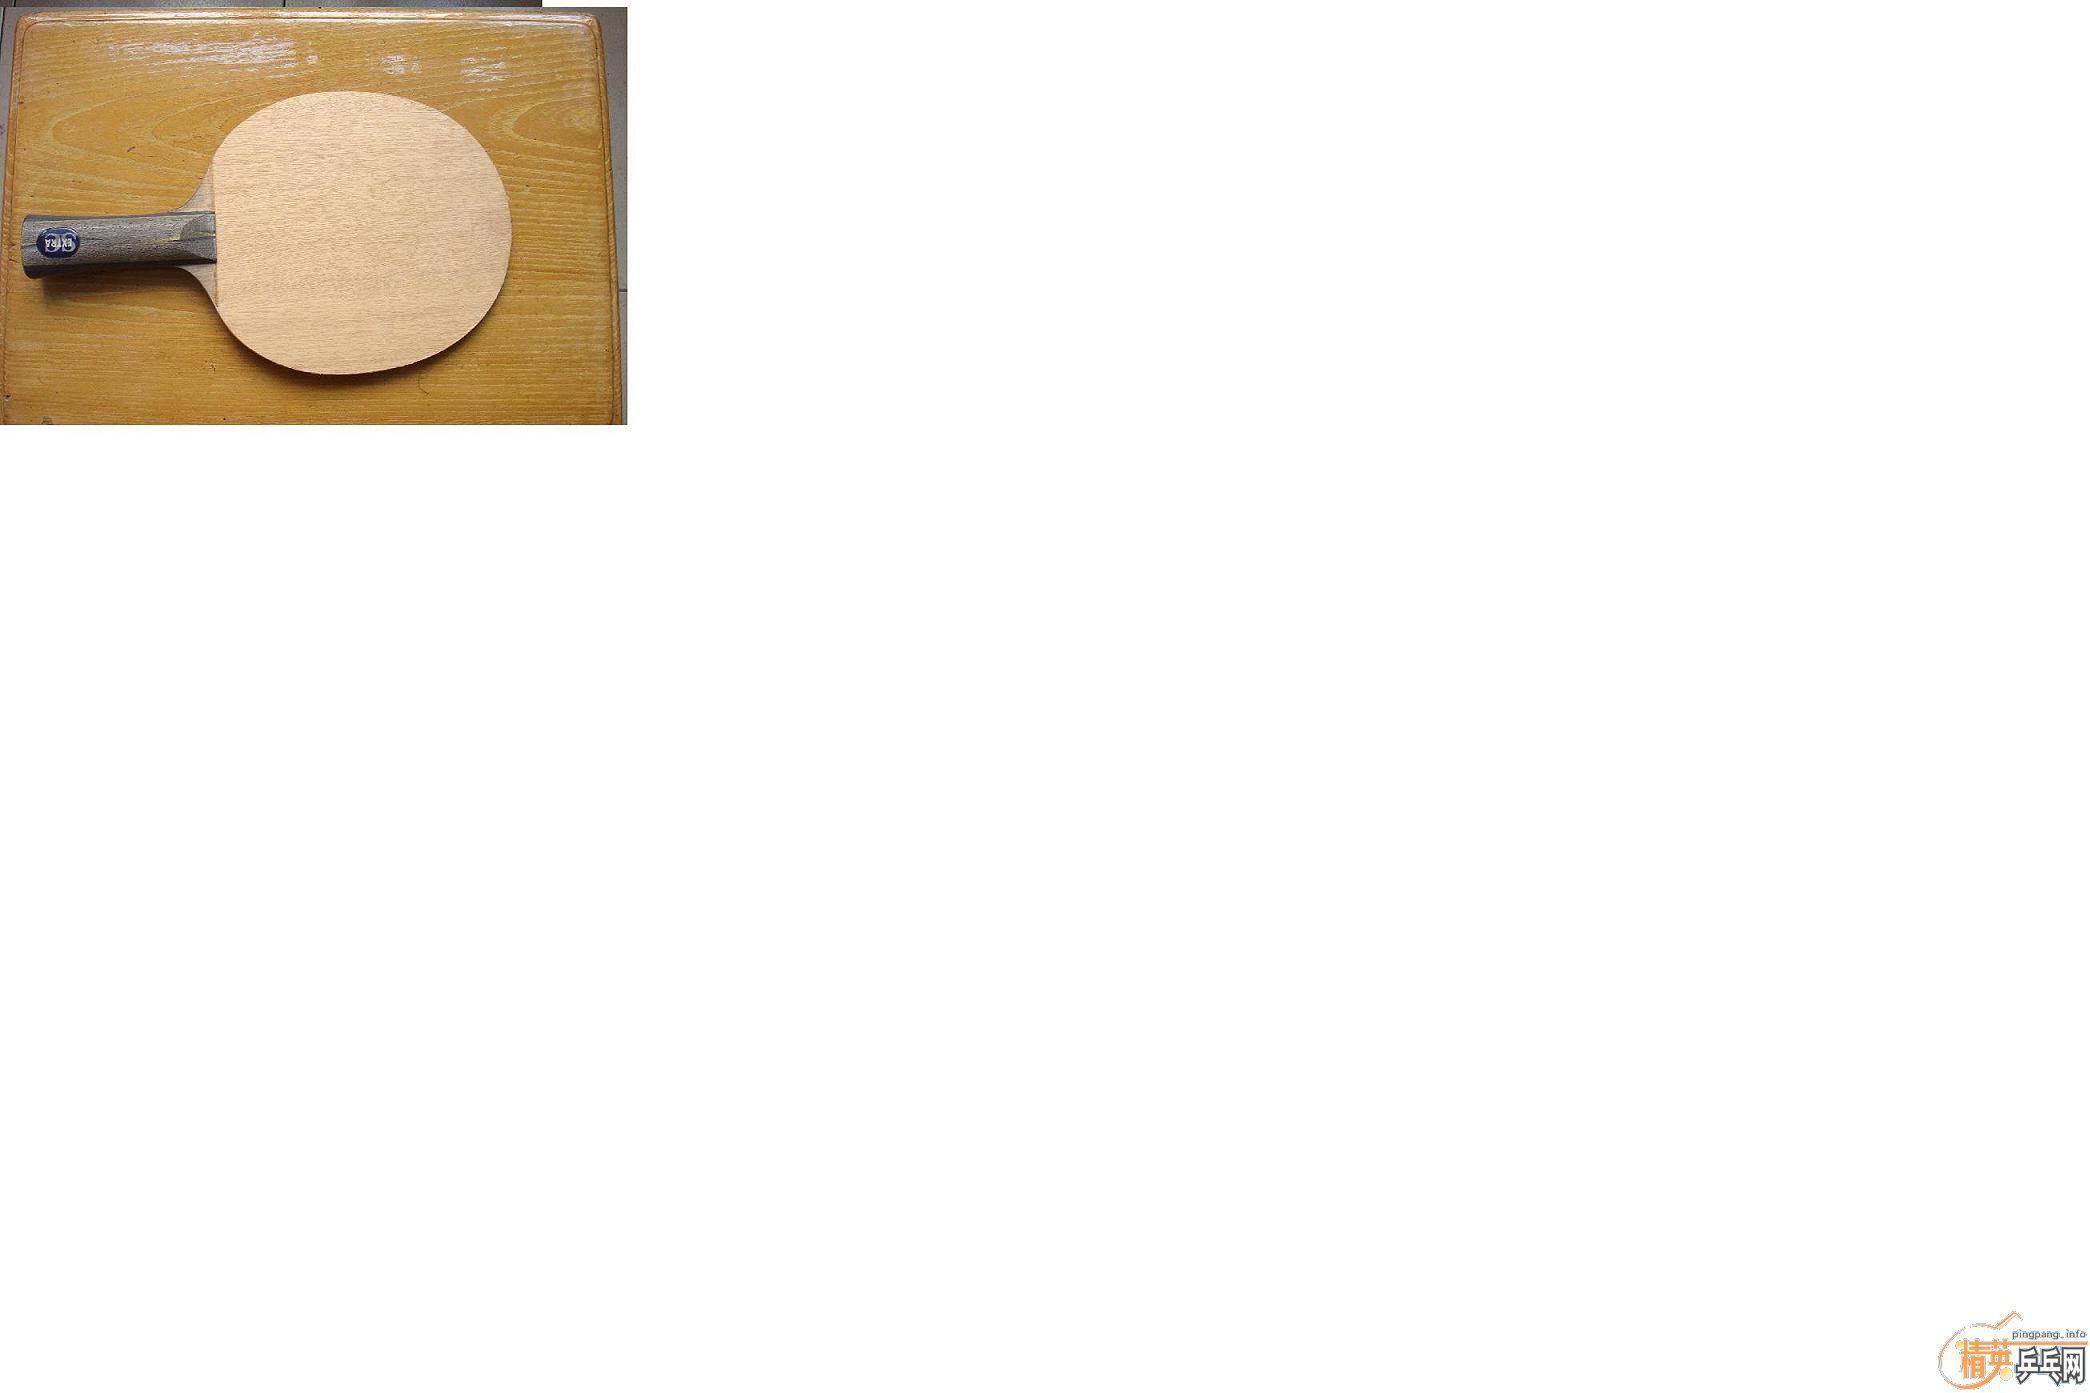 ppt 背景 背景图片 边框 模板 设计 矢量 矢量图 素材 相框 2090_1393